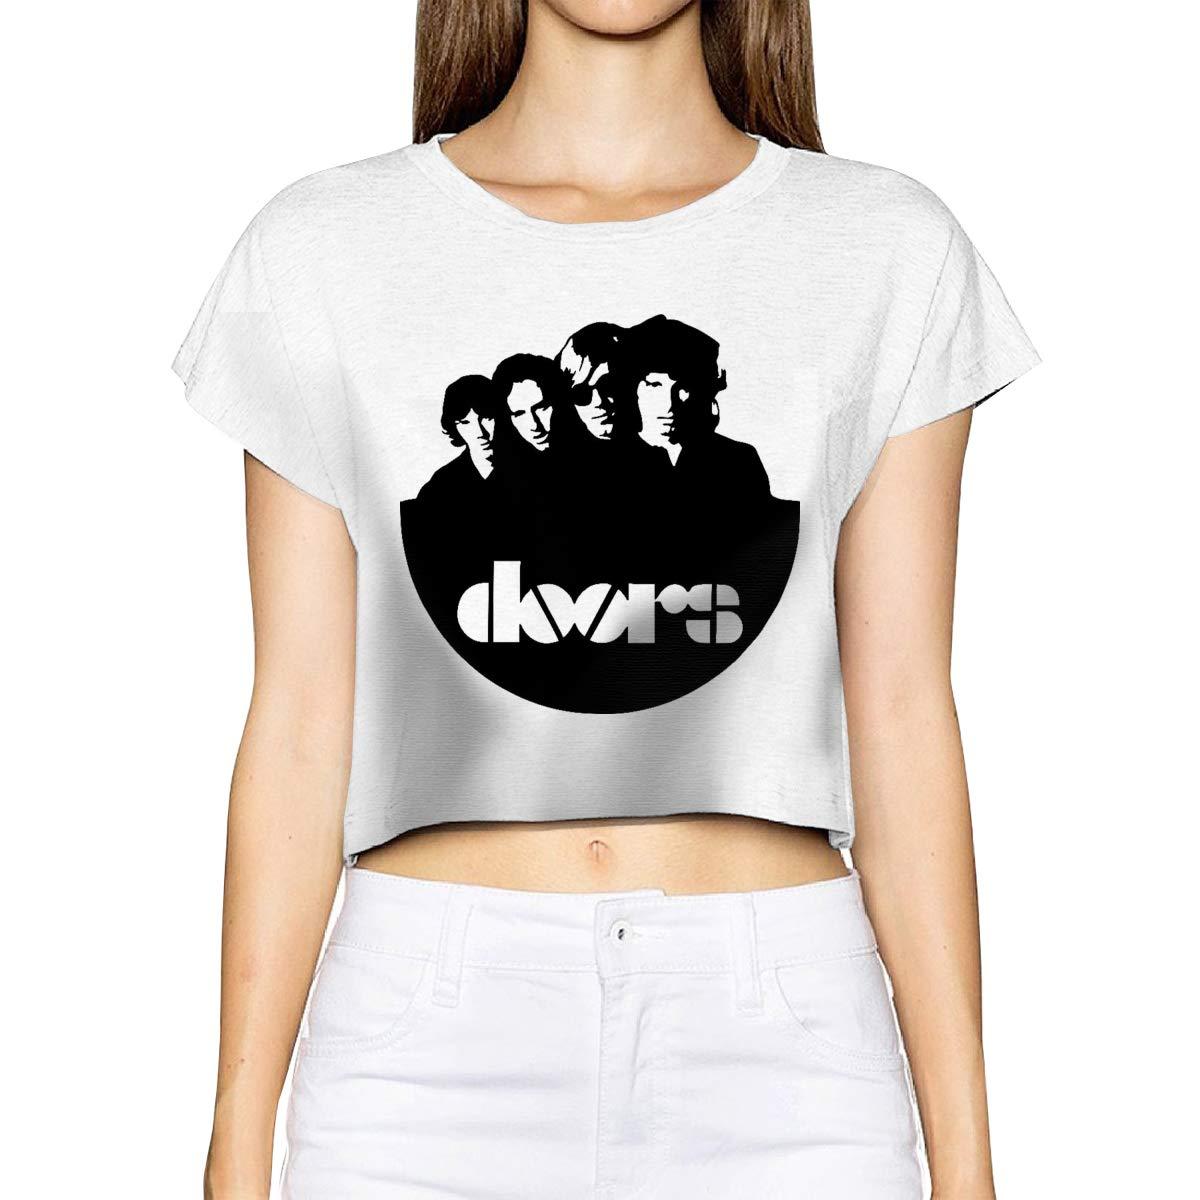 Smooffly Womens Crop Top The Doors Short Sleeves Shirts